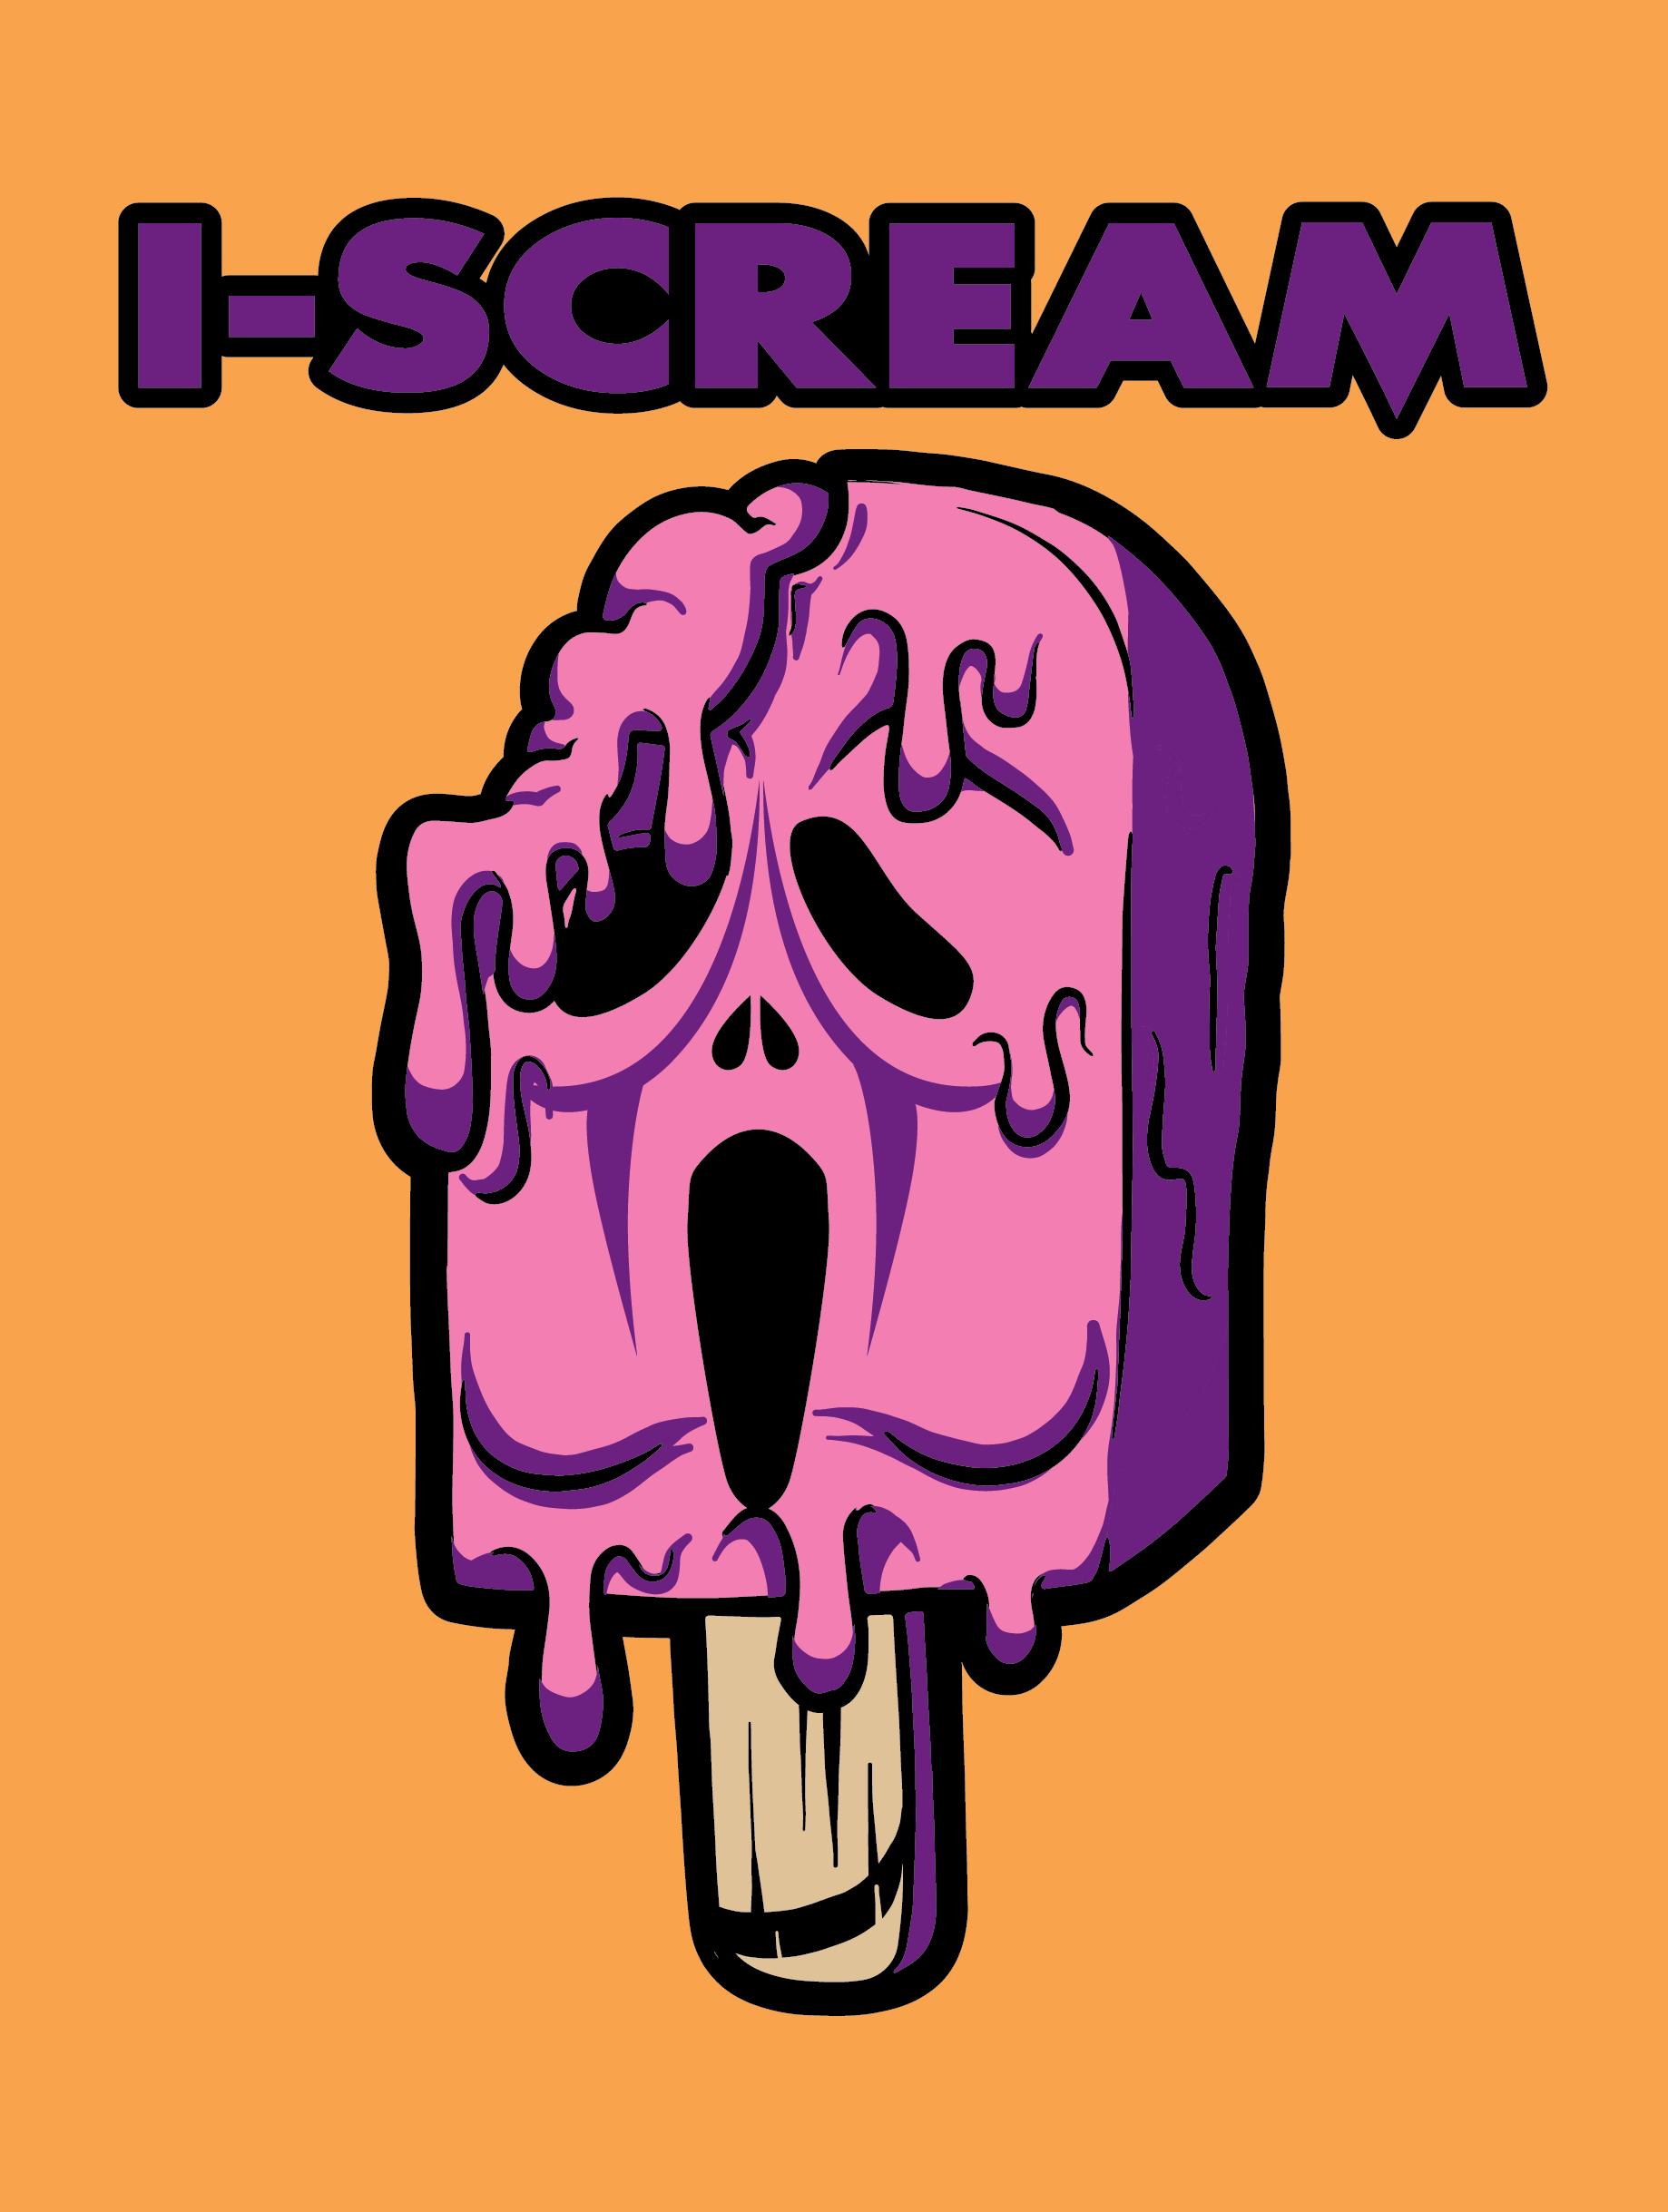 I-SCREAM-01.png